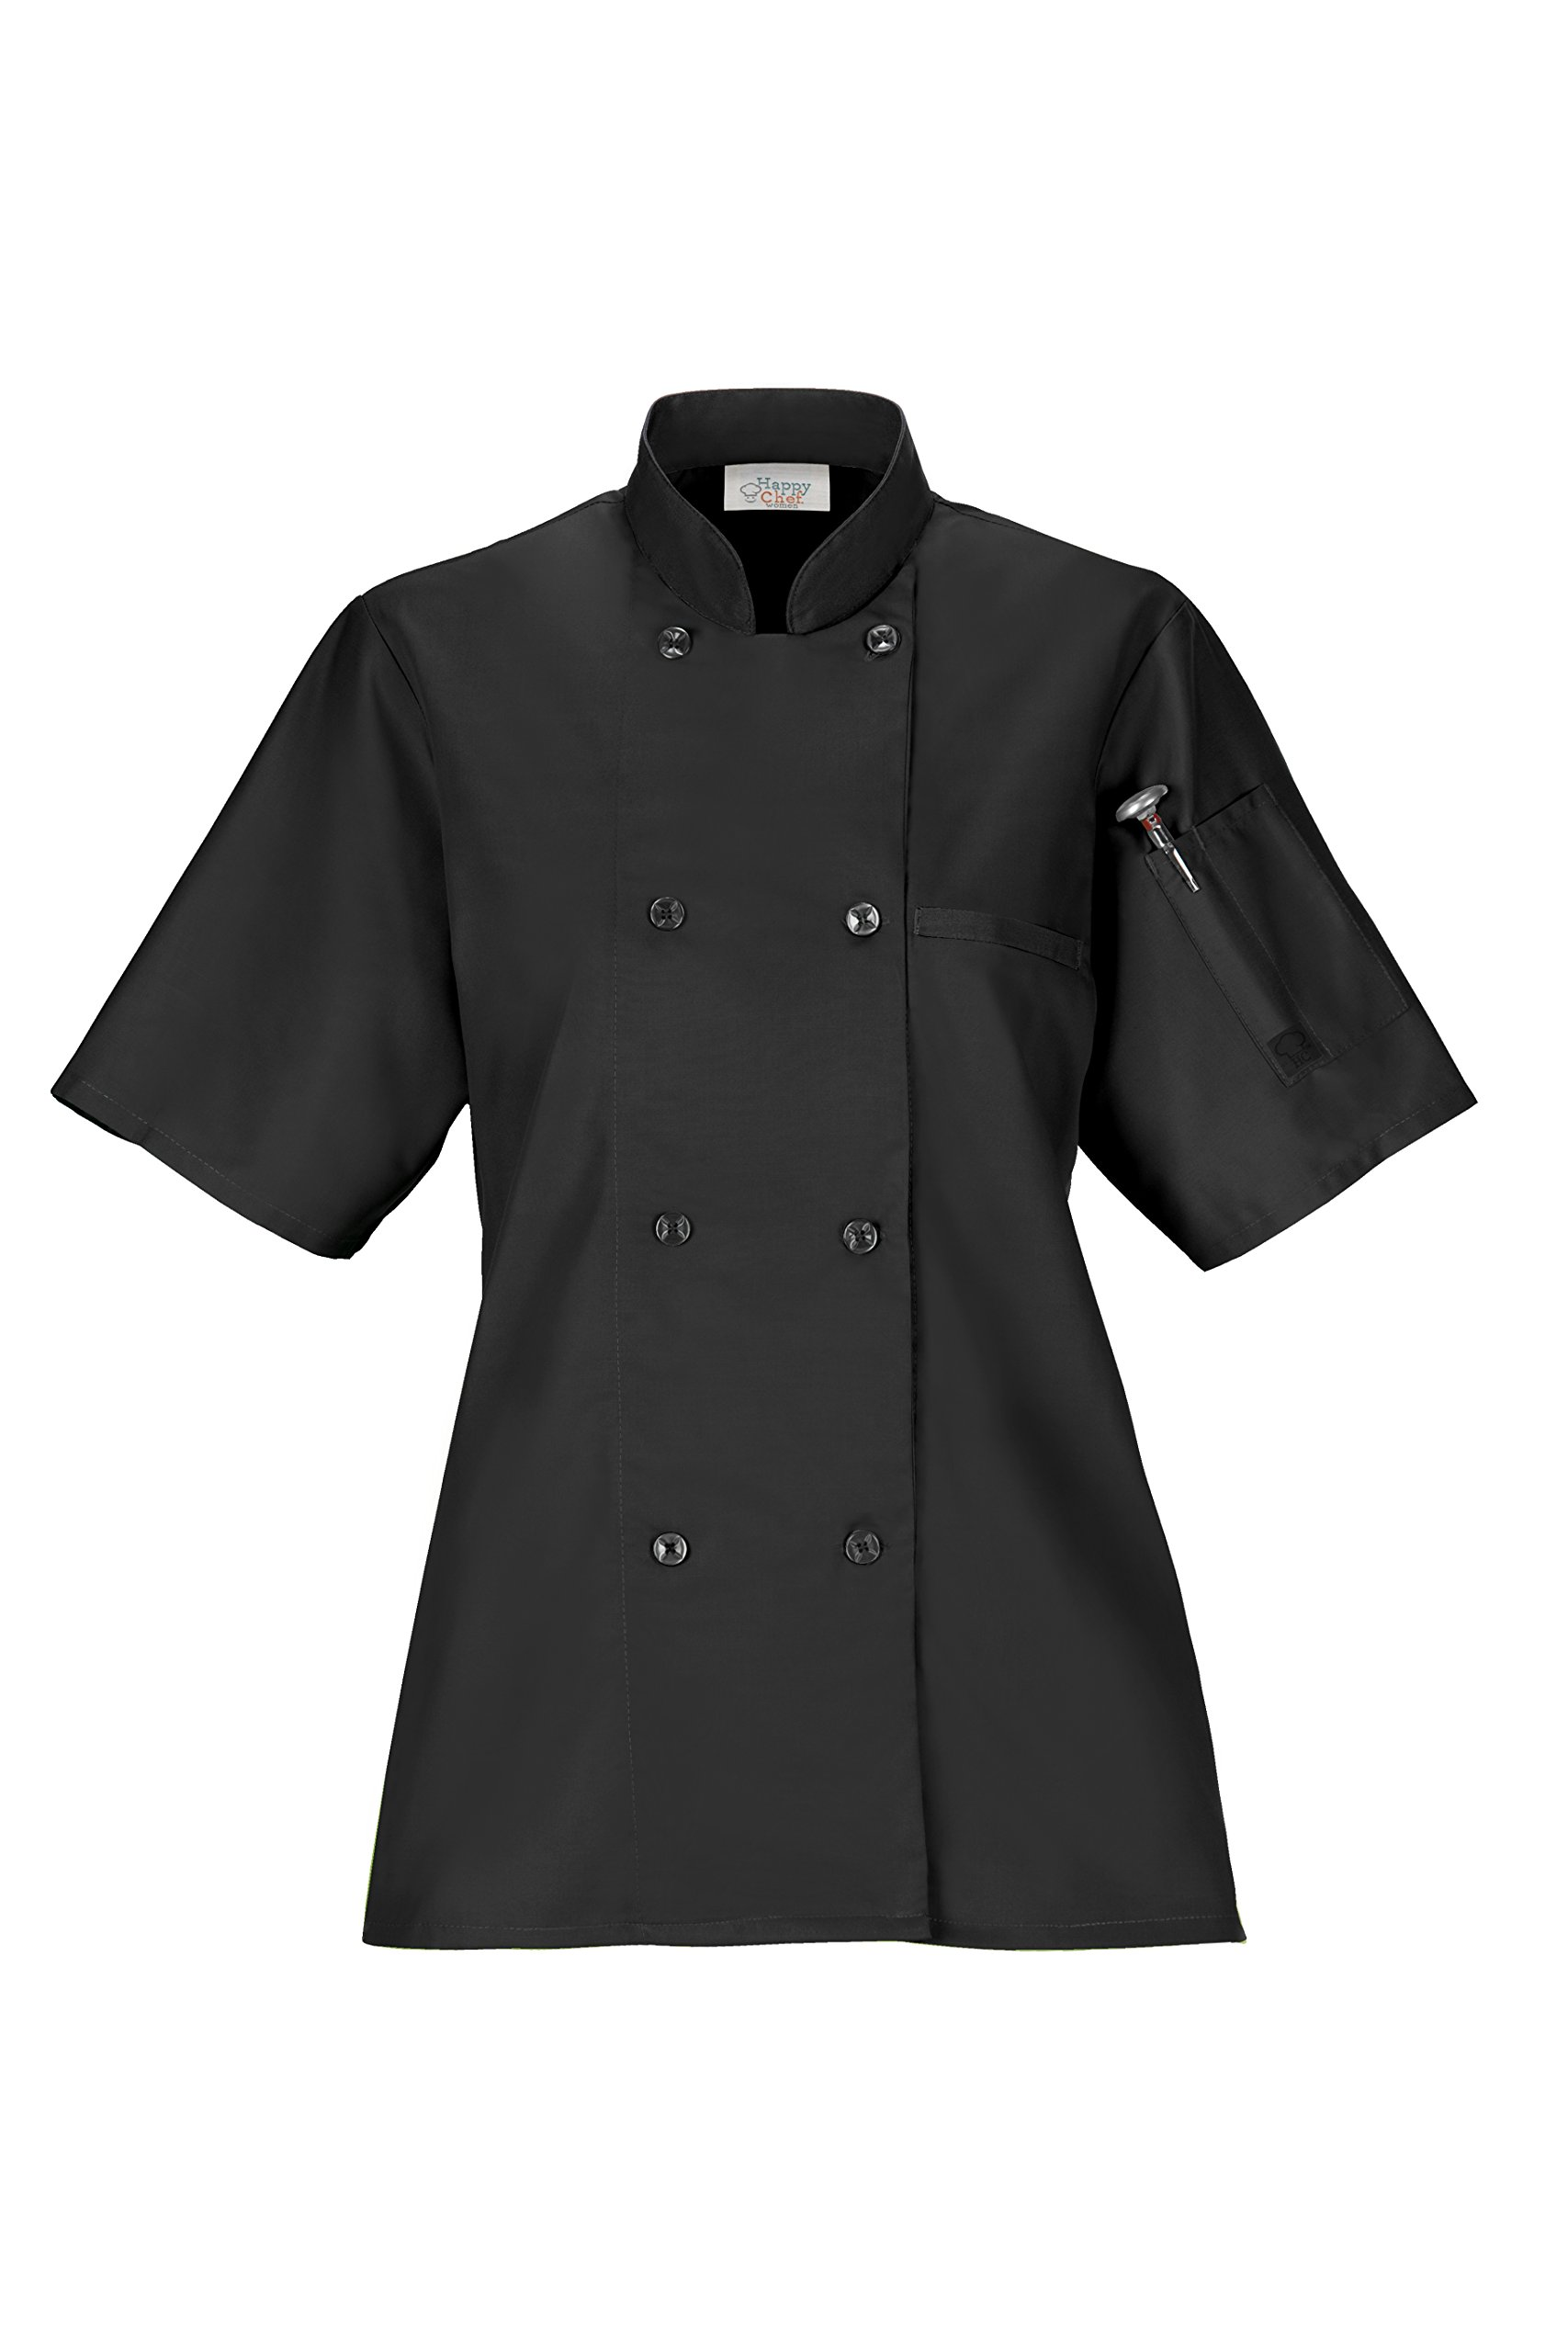 Women's Lightweight Chef Coat (Medium, Black)